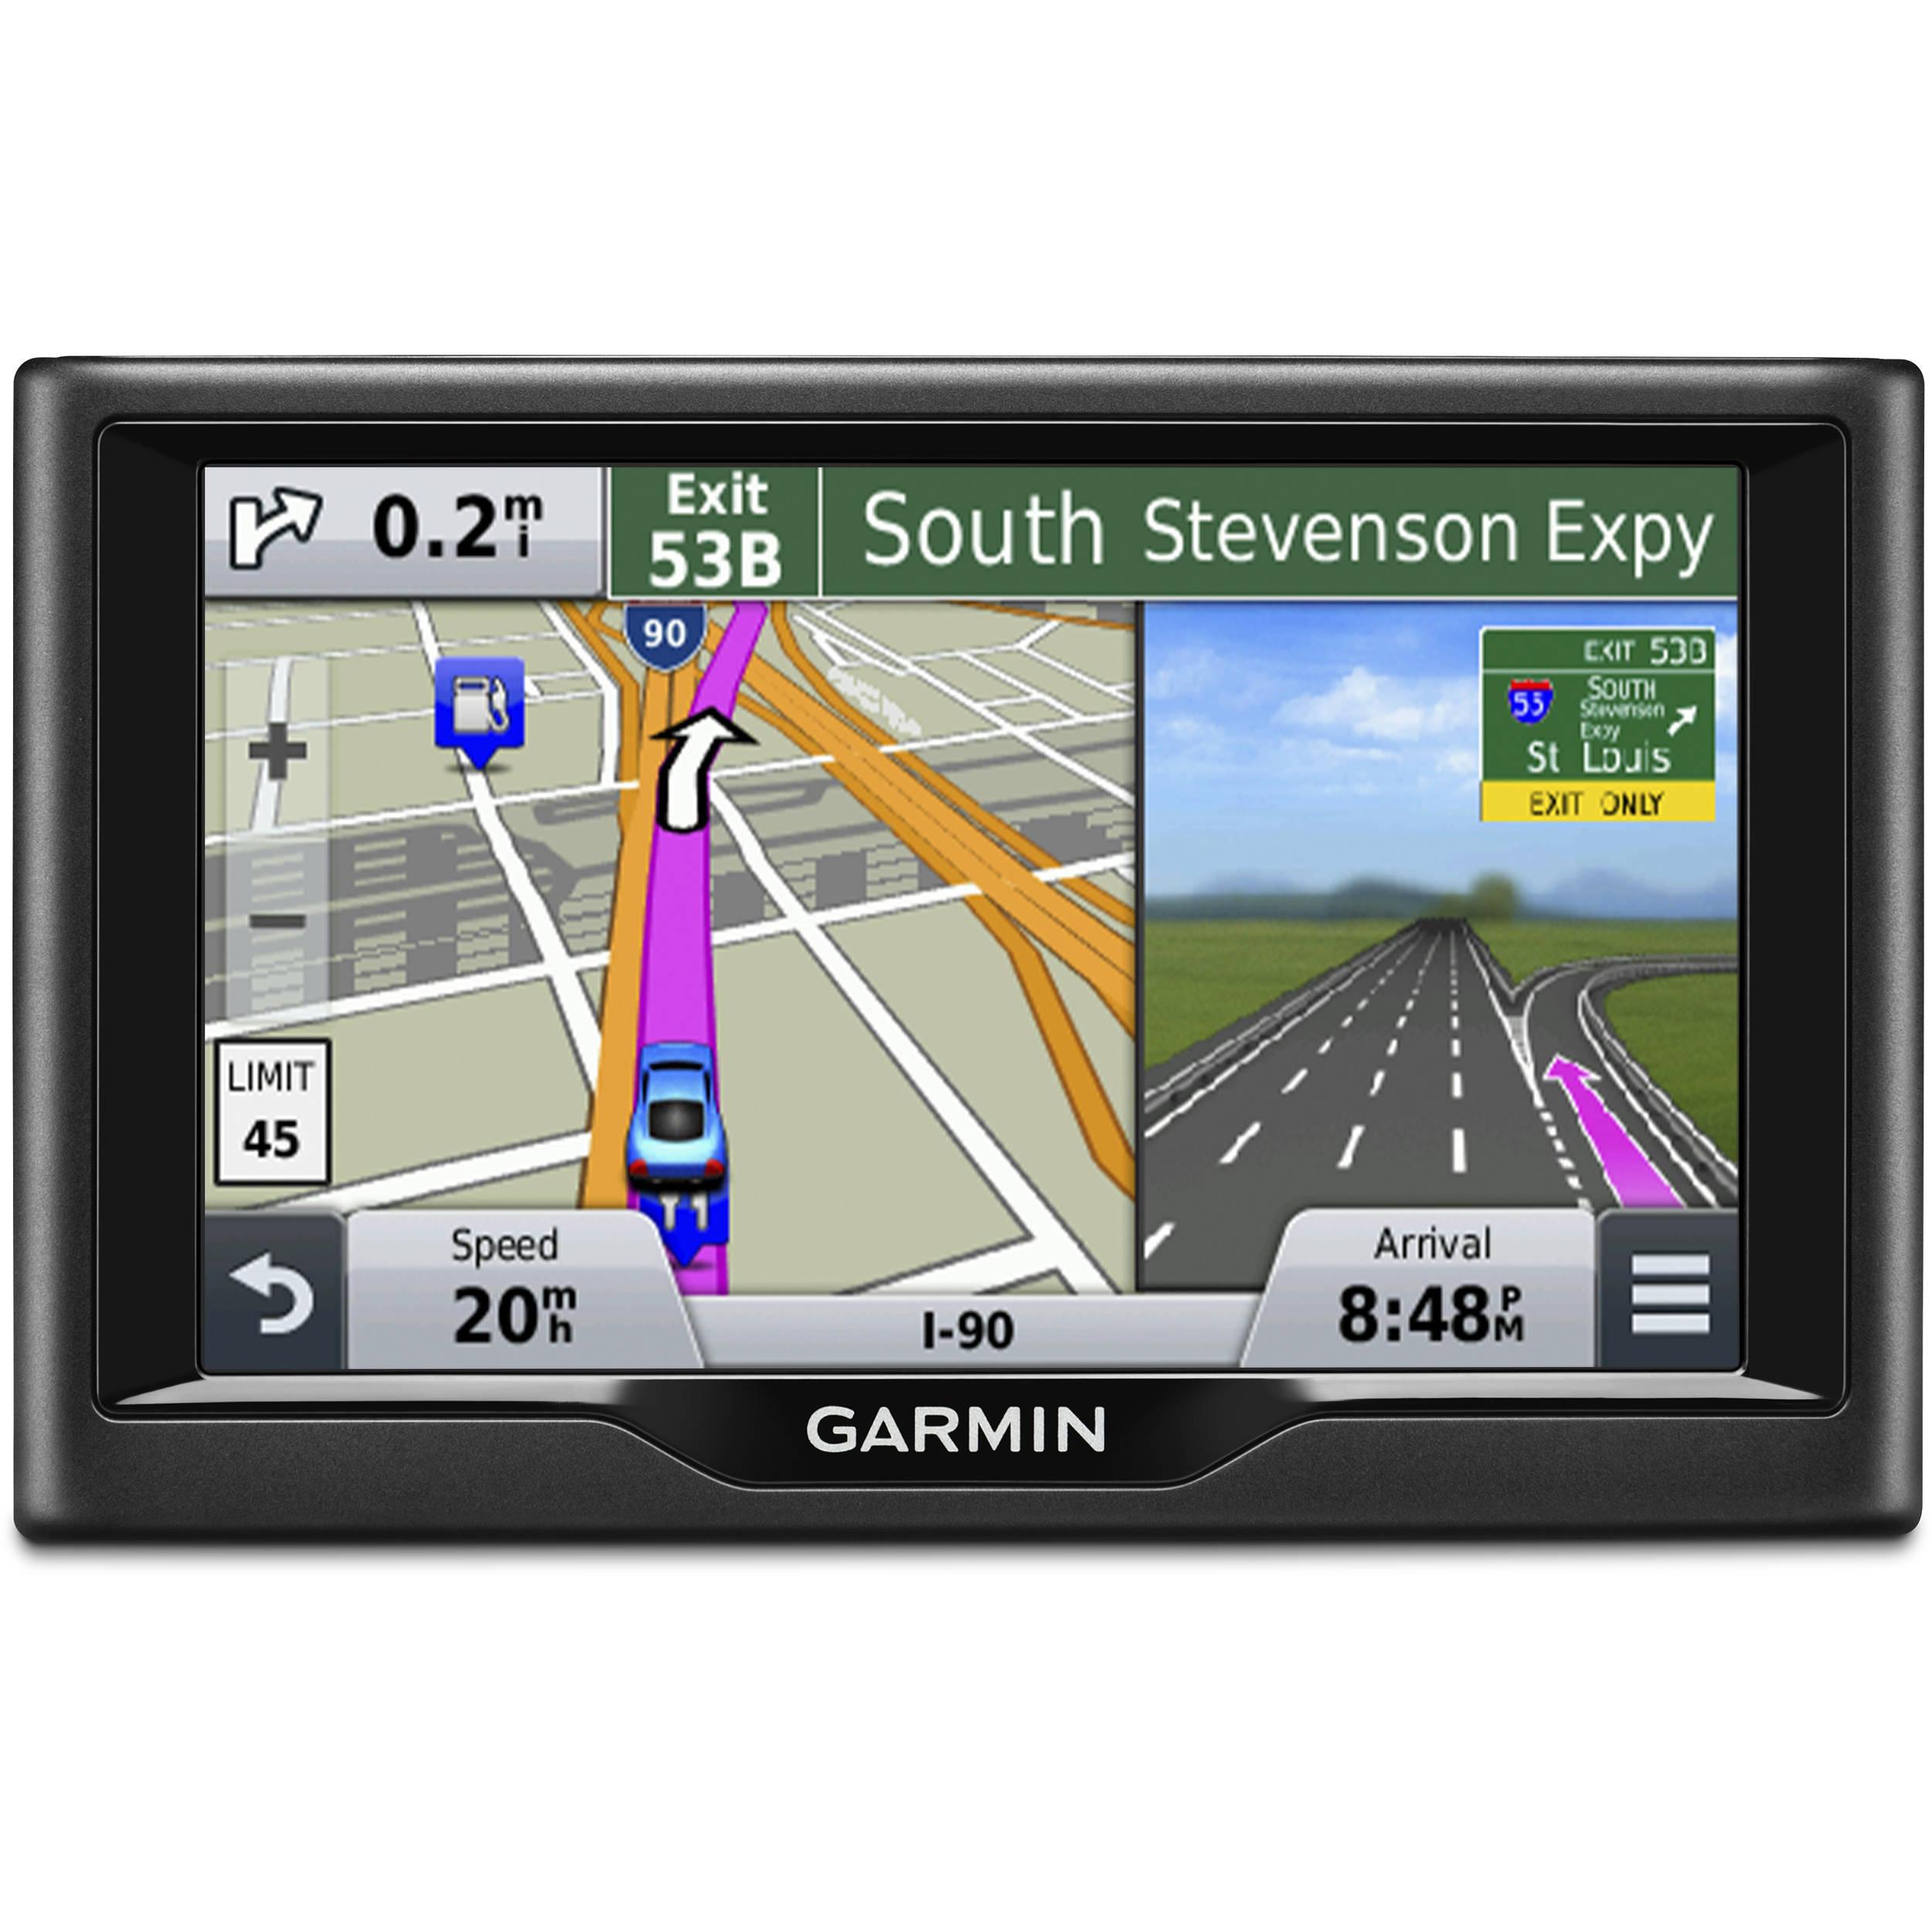 TELECHARGEMENT VEHICULE GPS GARMIN CARTES OPENSTREETMAP GARMIN TéLéCHARGEMENT DES CARTES - Cauticpokompti